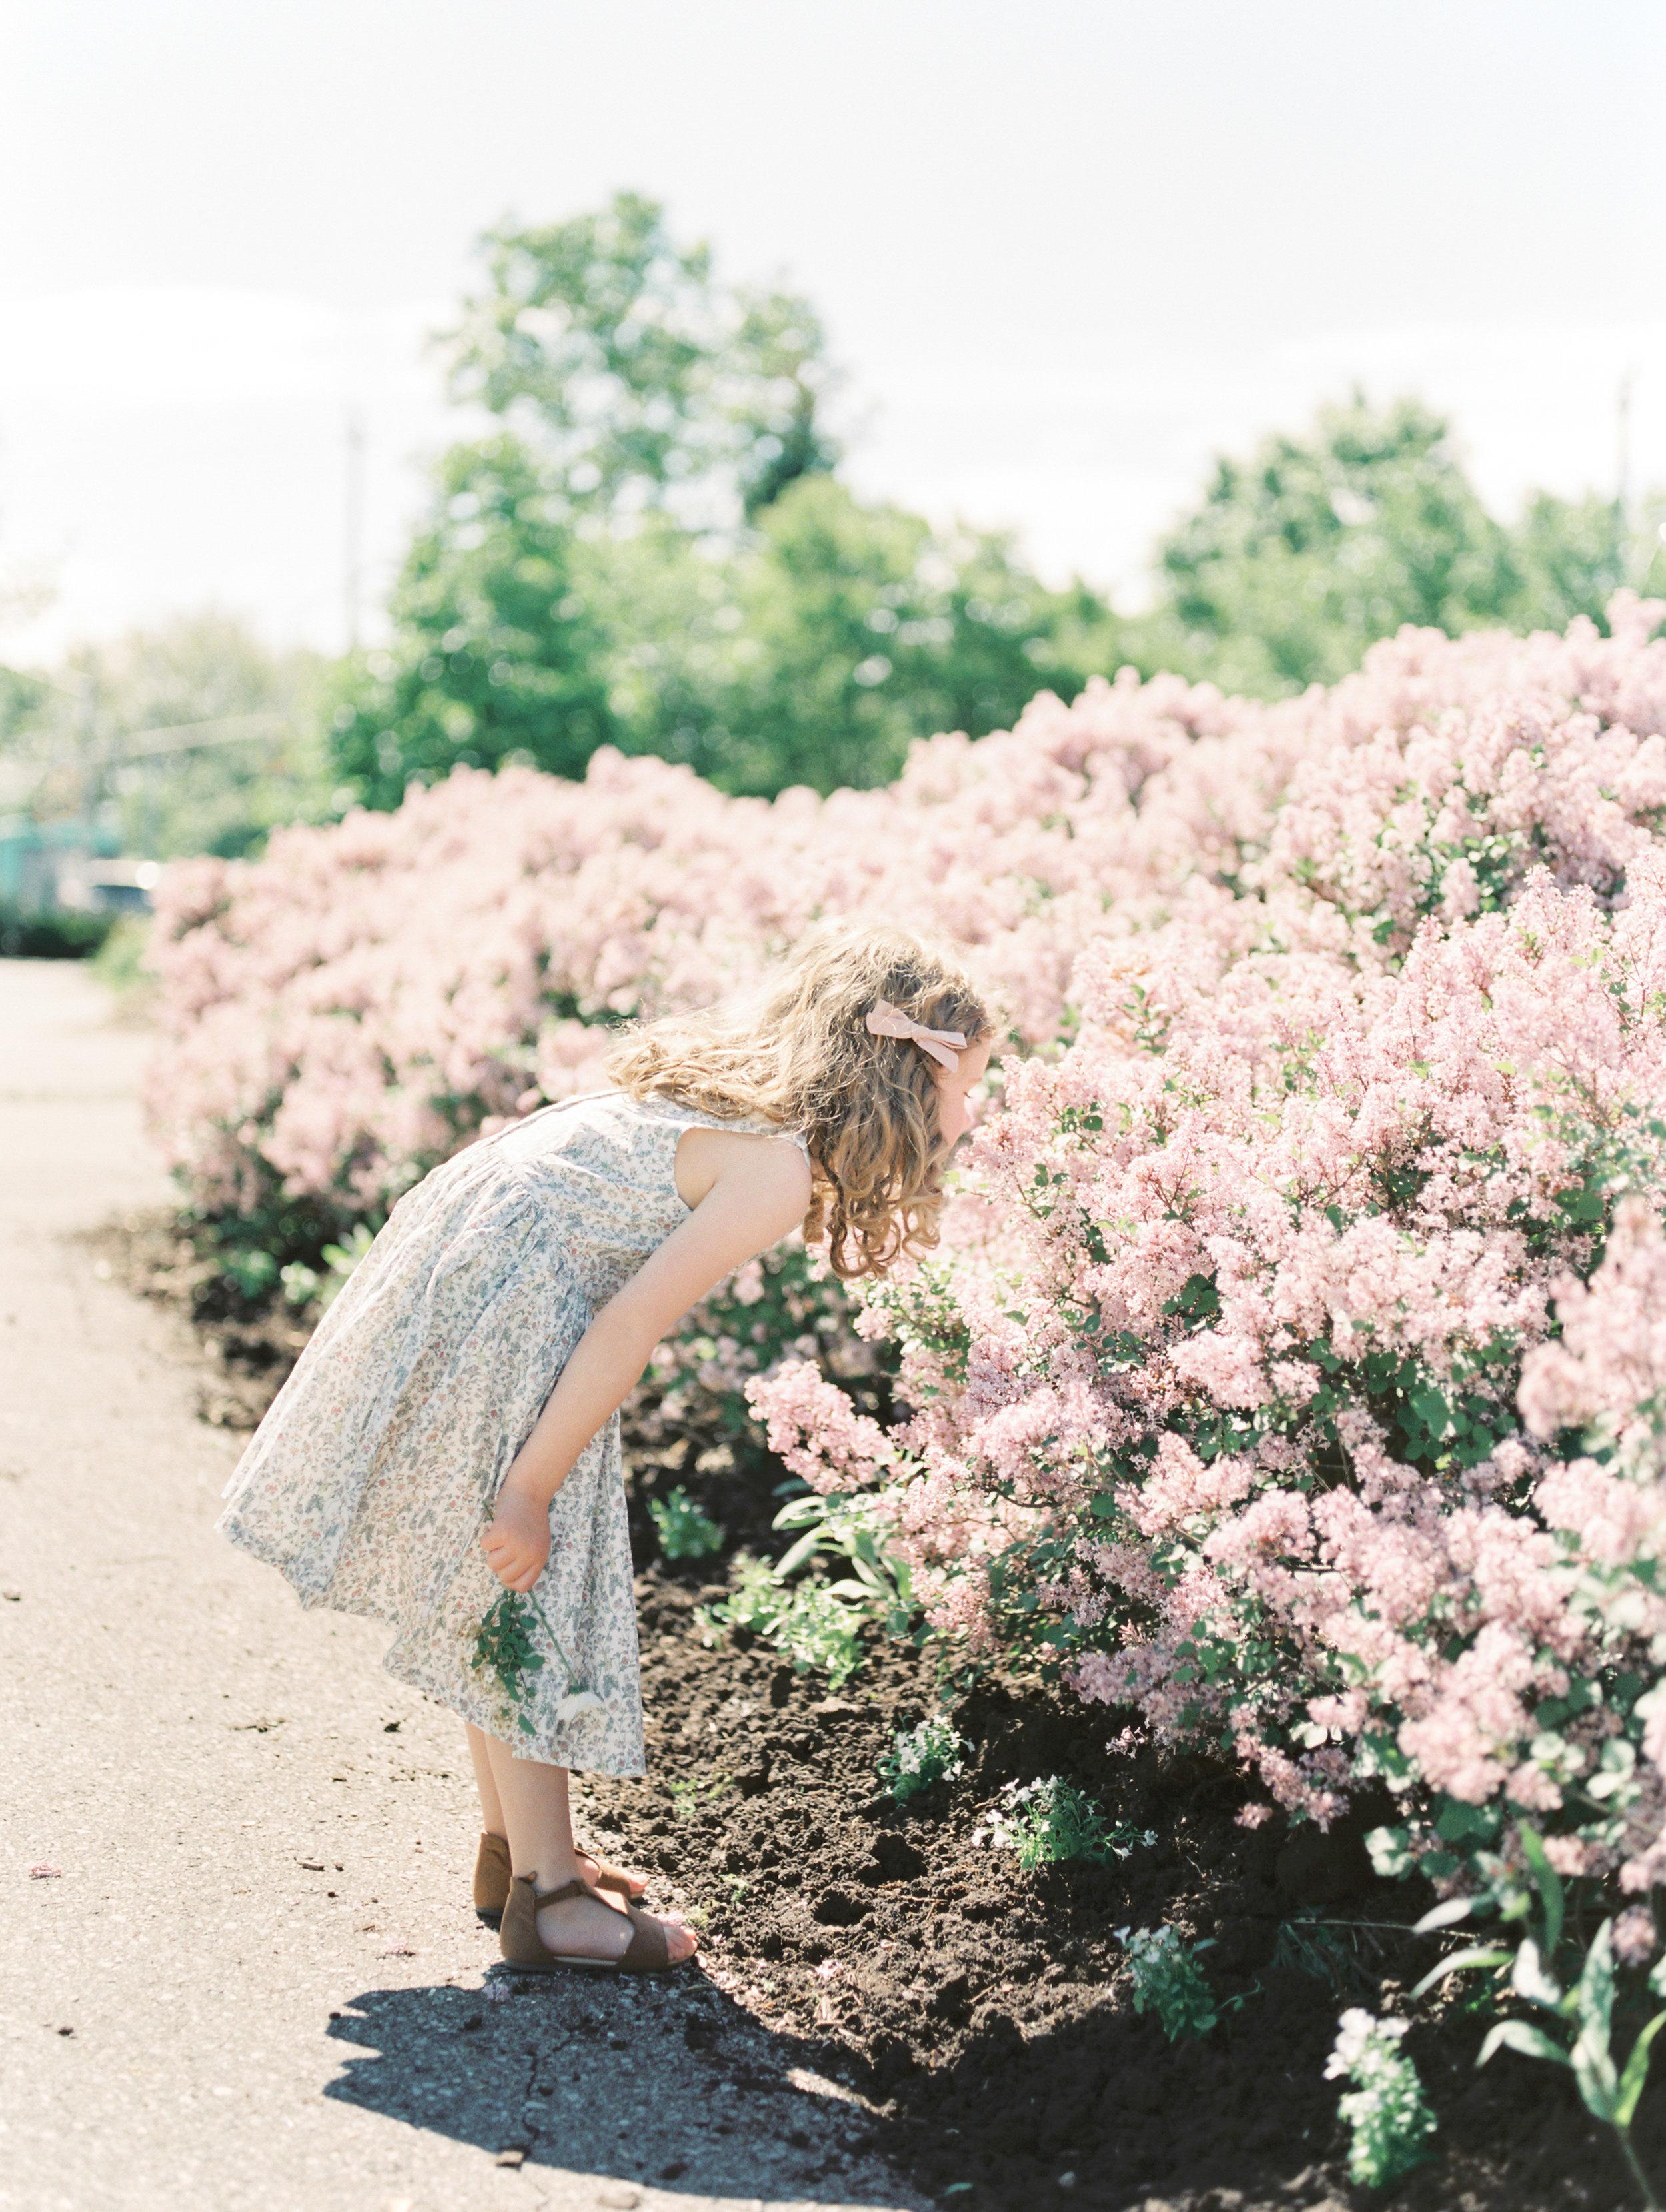 Elza Photographie_LA-13.jpg